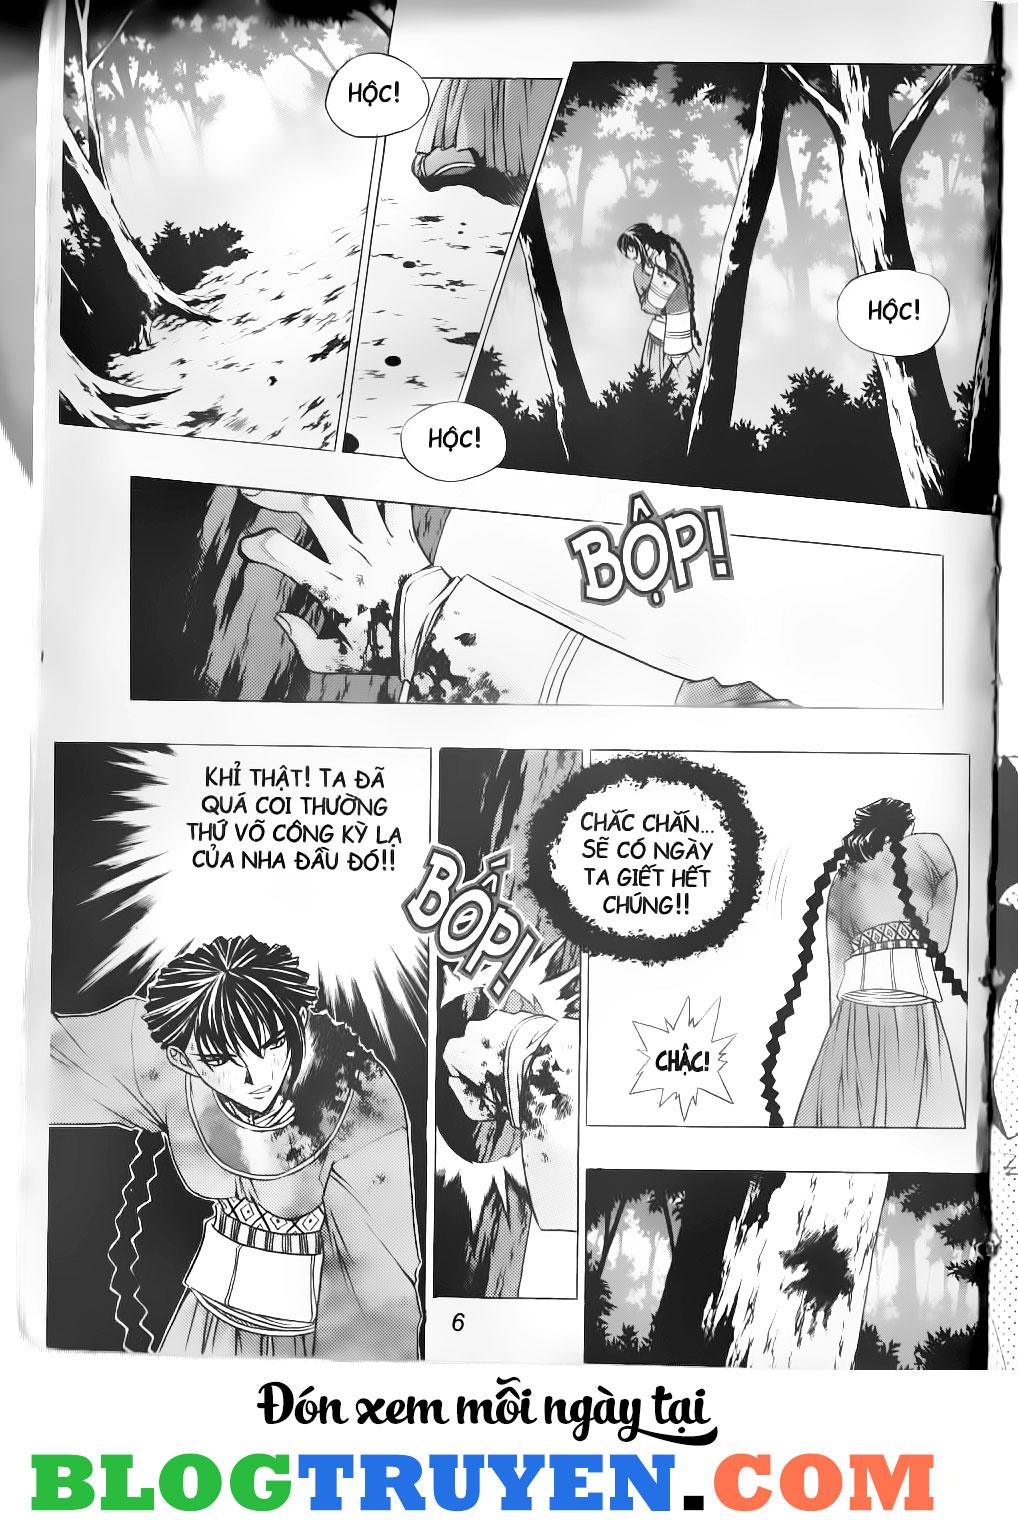 Thiên Lang Liệt Truyện Scan Chap 27 - Truyen.Chap.VN